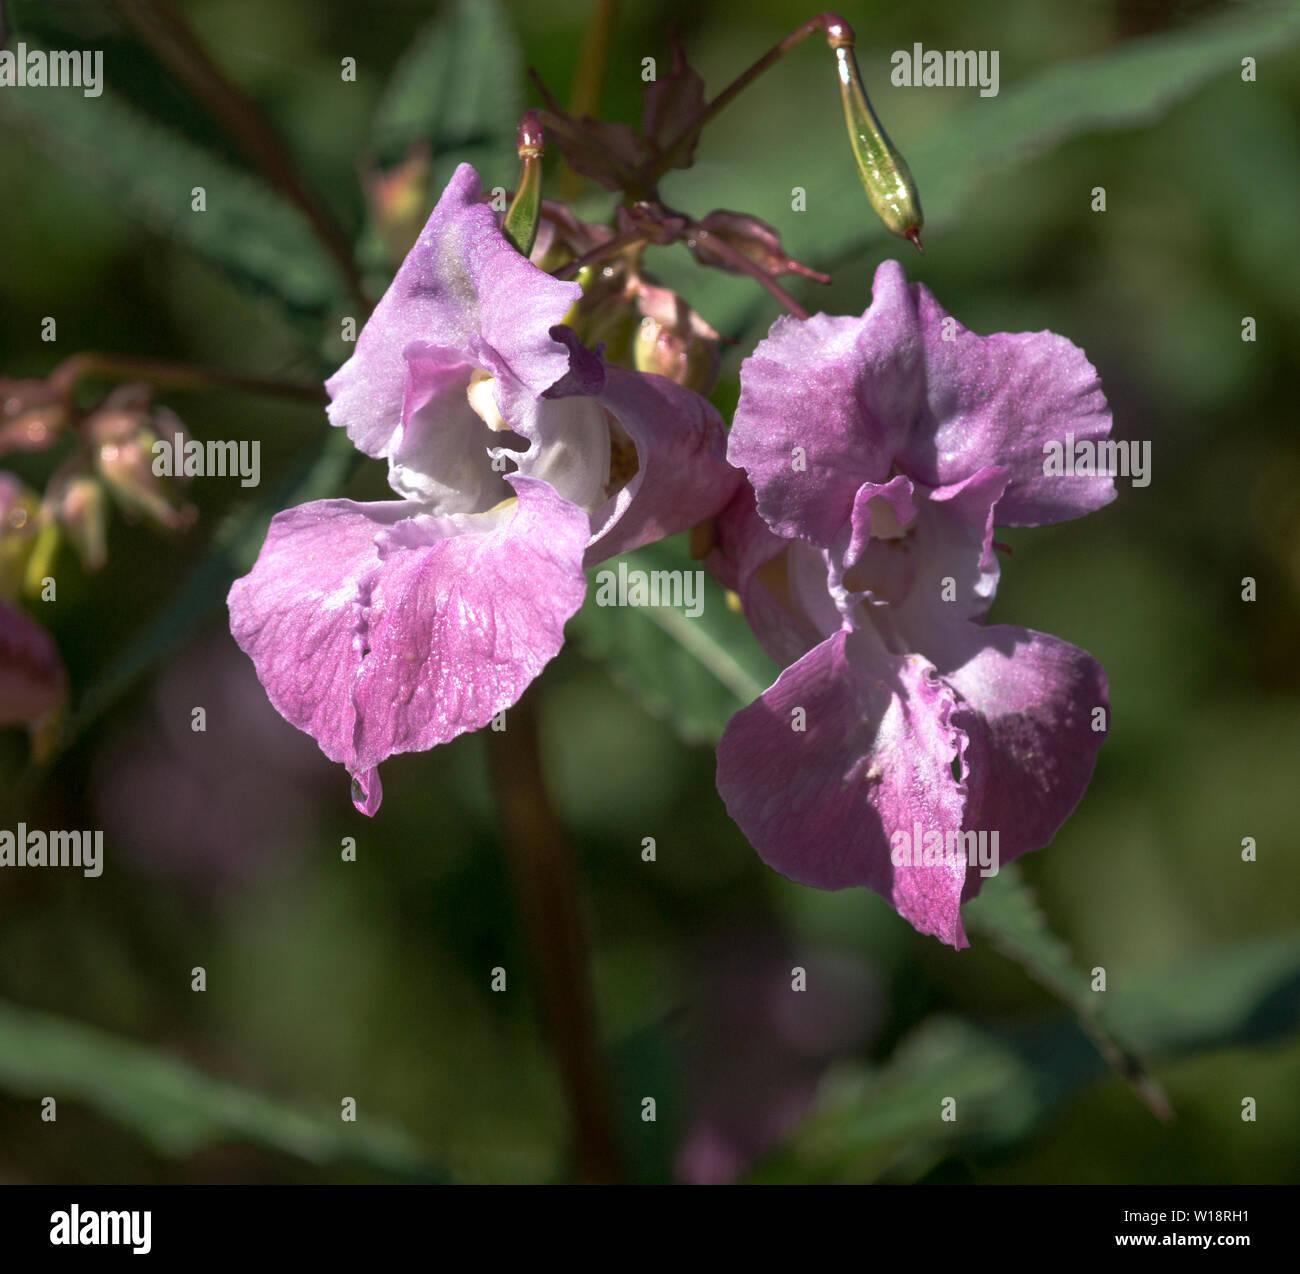 Flowers of the Himalayan Balsam (Impatiens glandulifera). Stock Photo